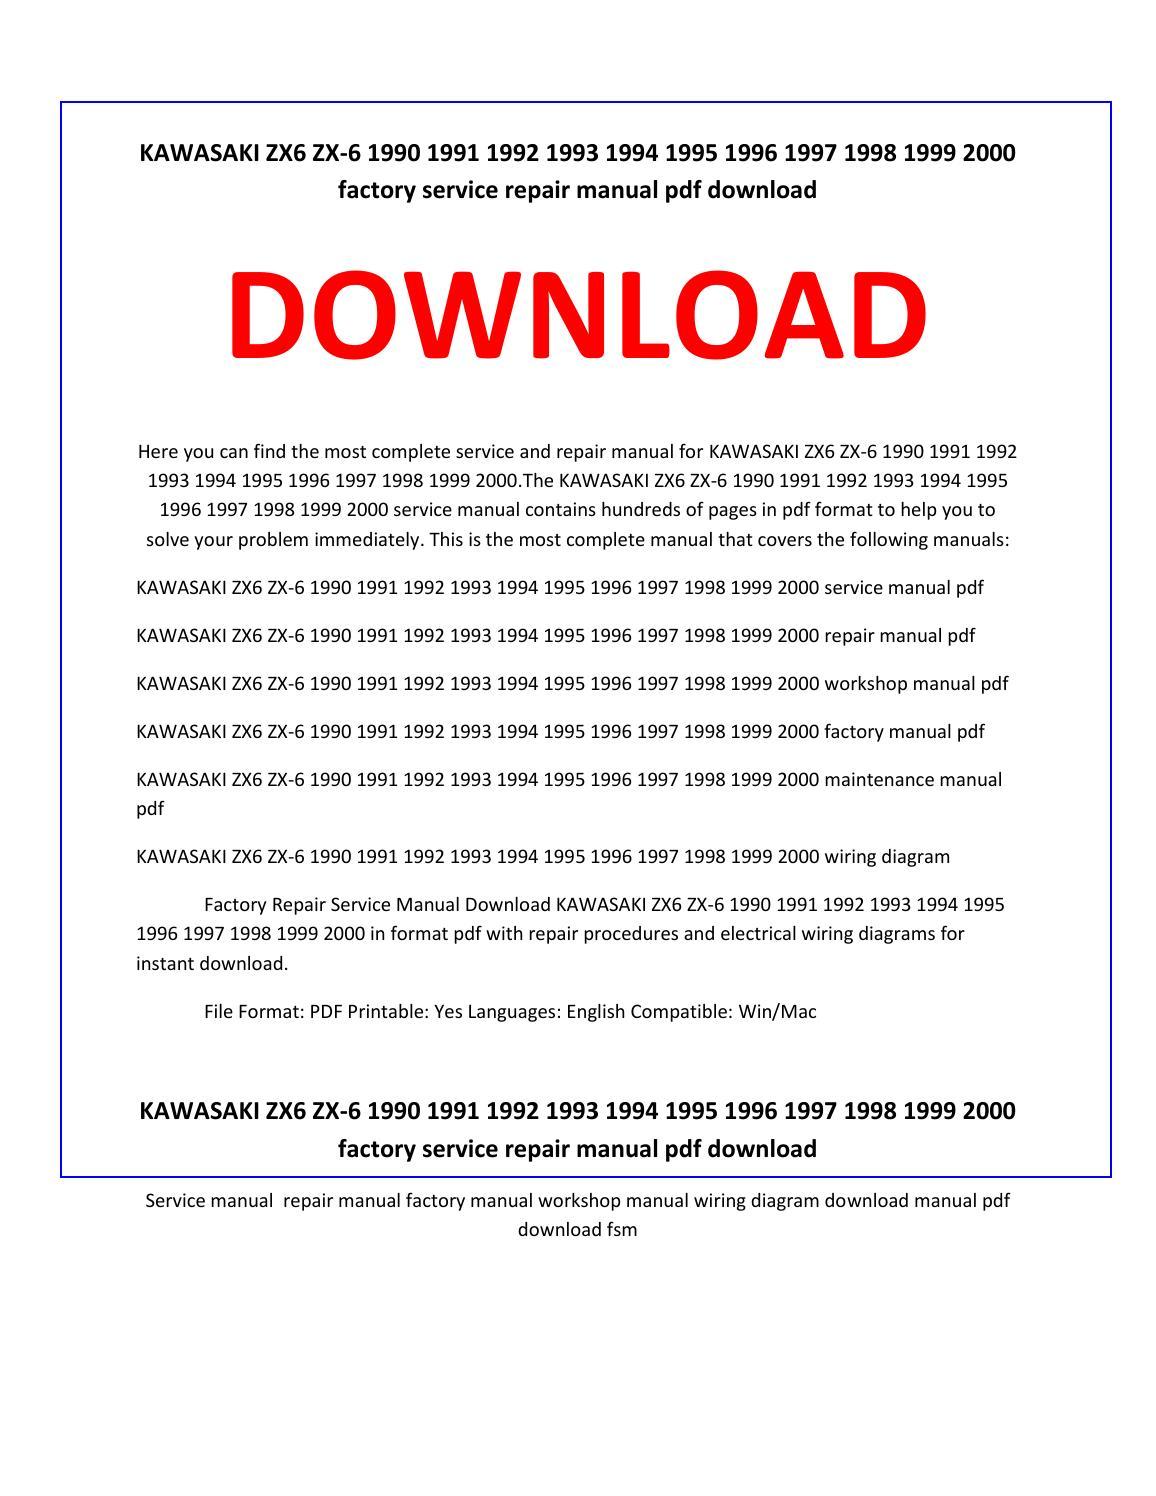 hight resolution of kawasaki zx6 zx 6 1990 1991 1992 1993 1994 1995 1996 1997 1998 1999 2000 service repair manual by service manual issuu